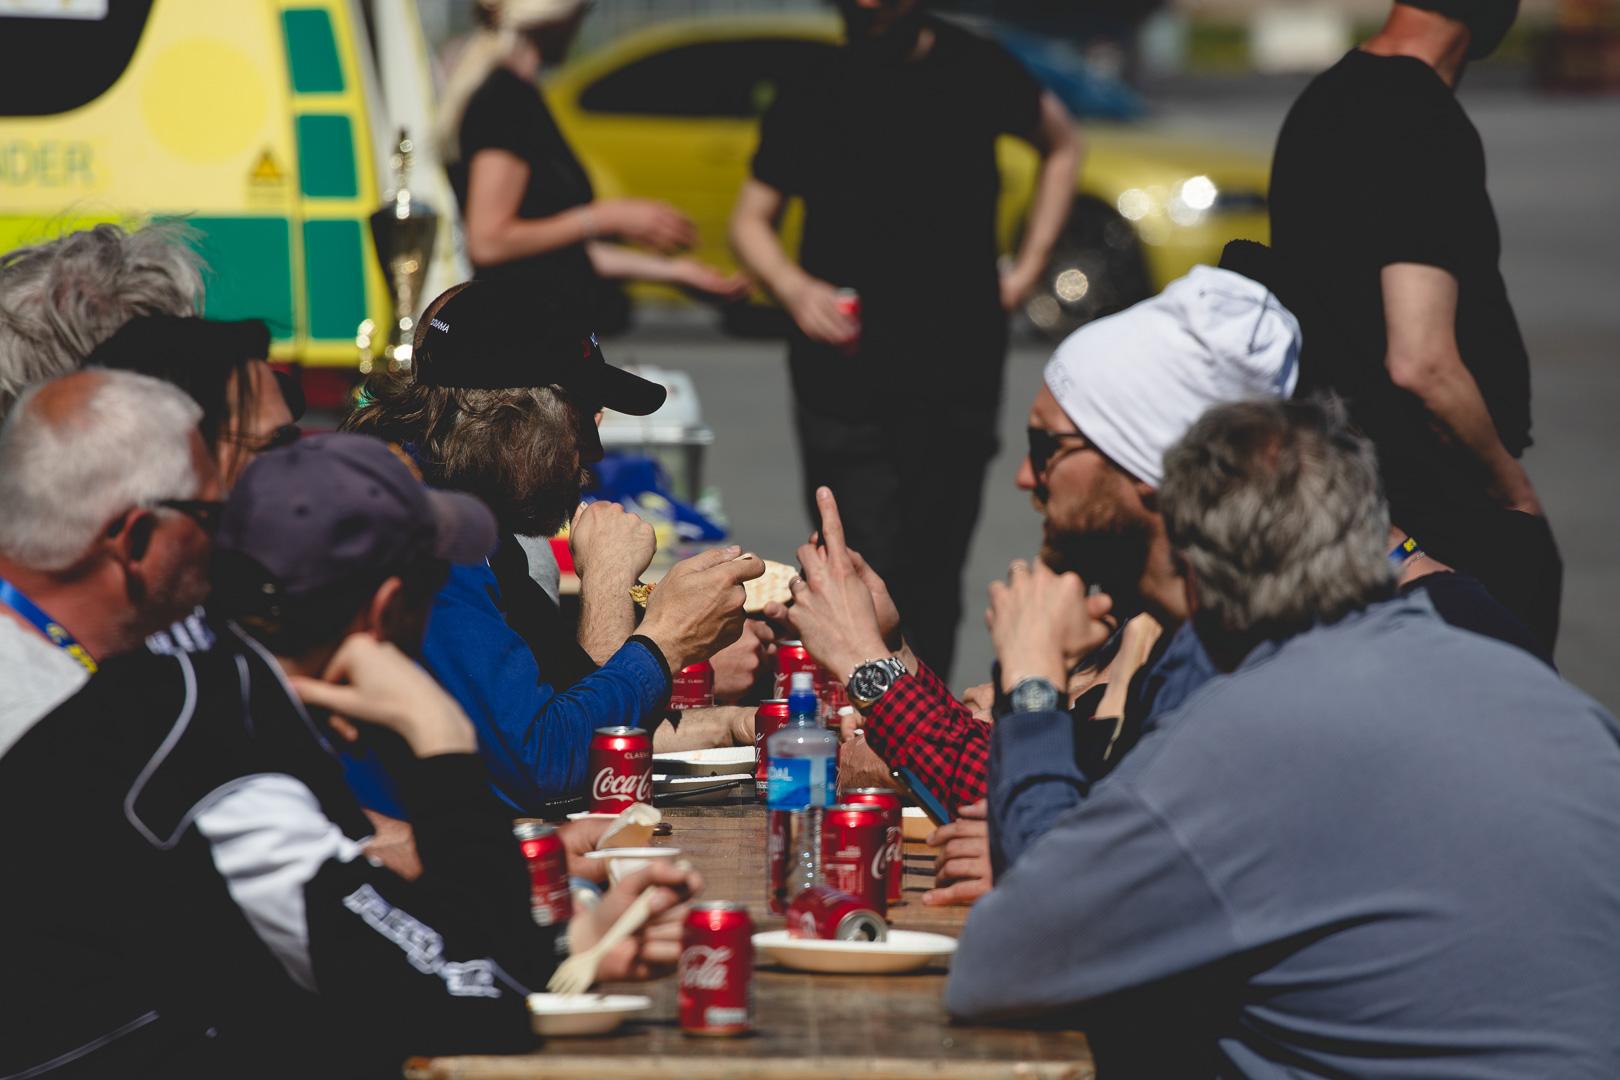 Förare med trailer - 7 500 kr - Anmäl ev. co-driver separatBoende 27-29 septemberRacedag 28 september